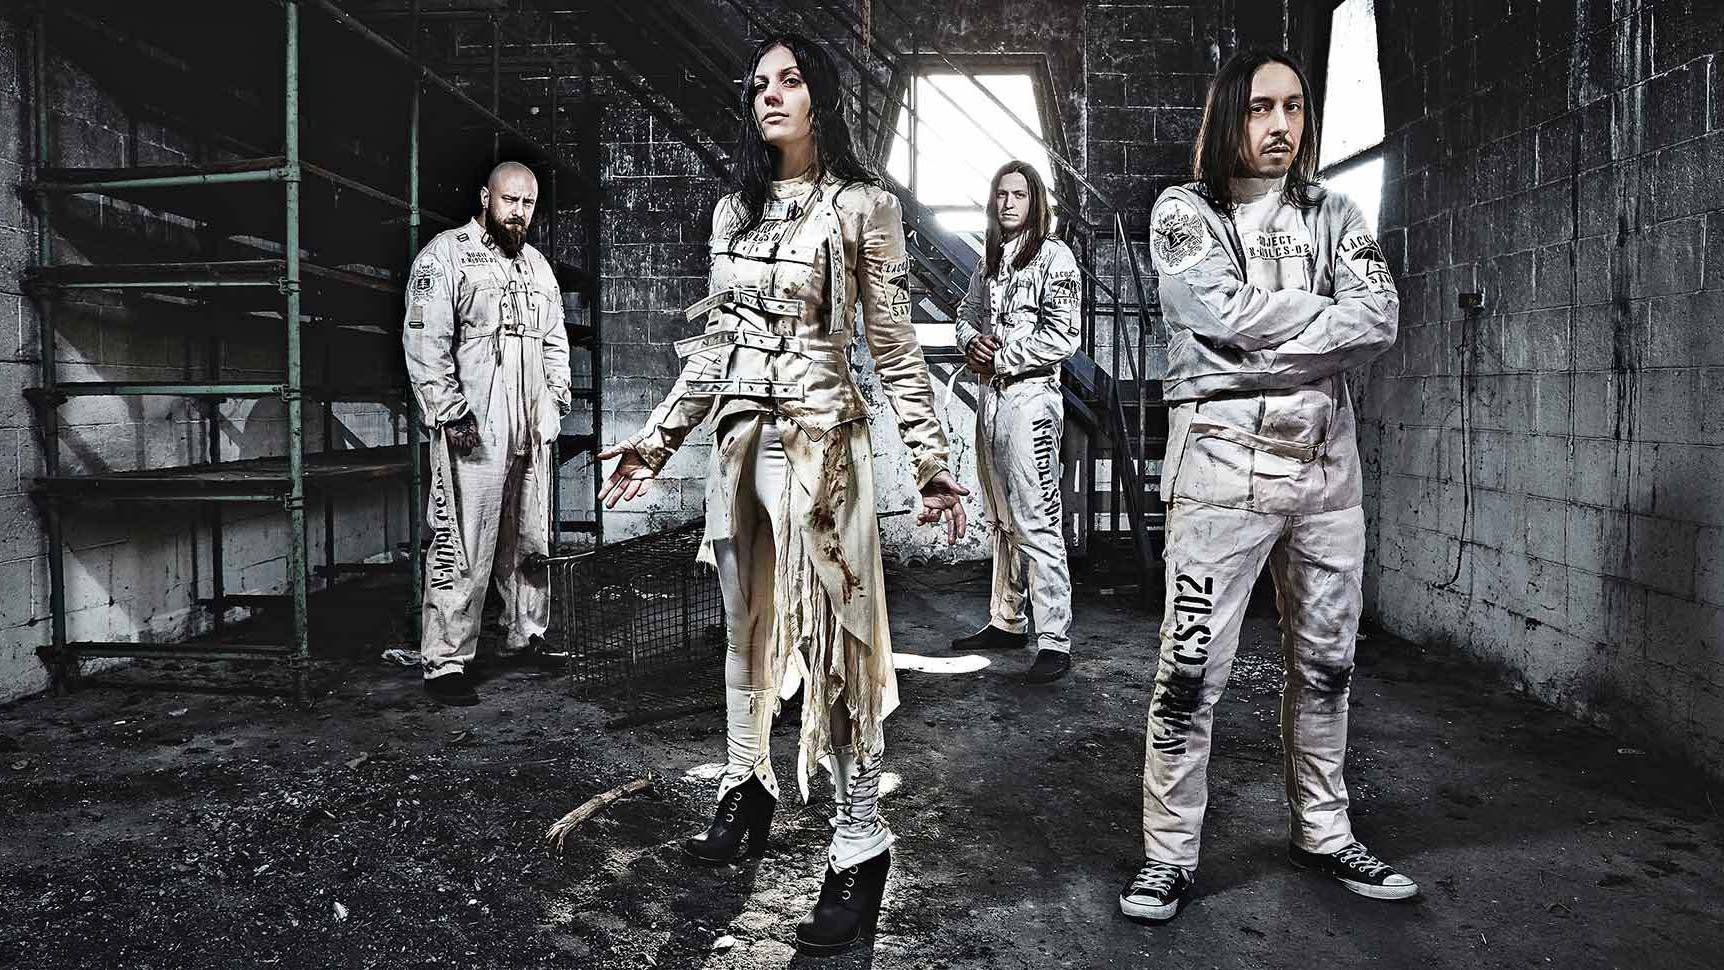 Lacuna Coil: Am 27. Mai 2016 erschien ihr neues Album DELIRIUM